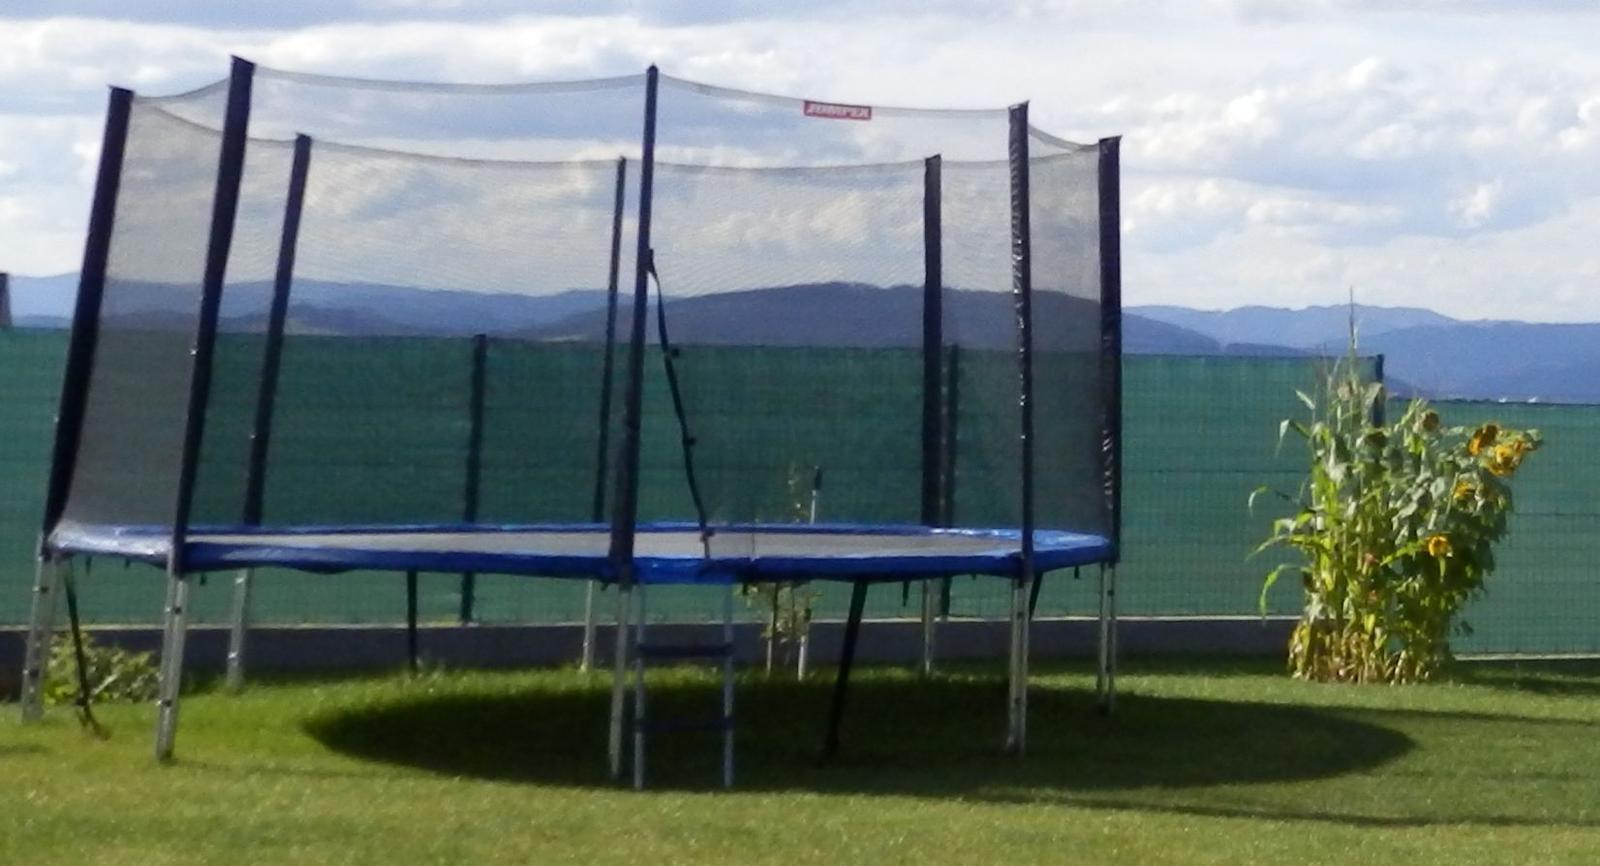 Trampolina Jumpex 4,27m priemer, nosnost 200 kg - Obrázok č. 1